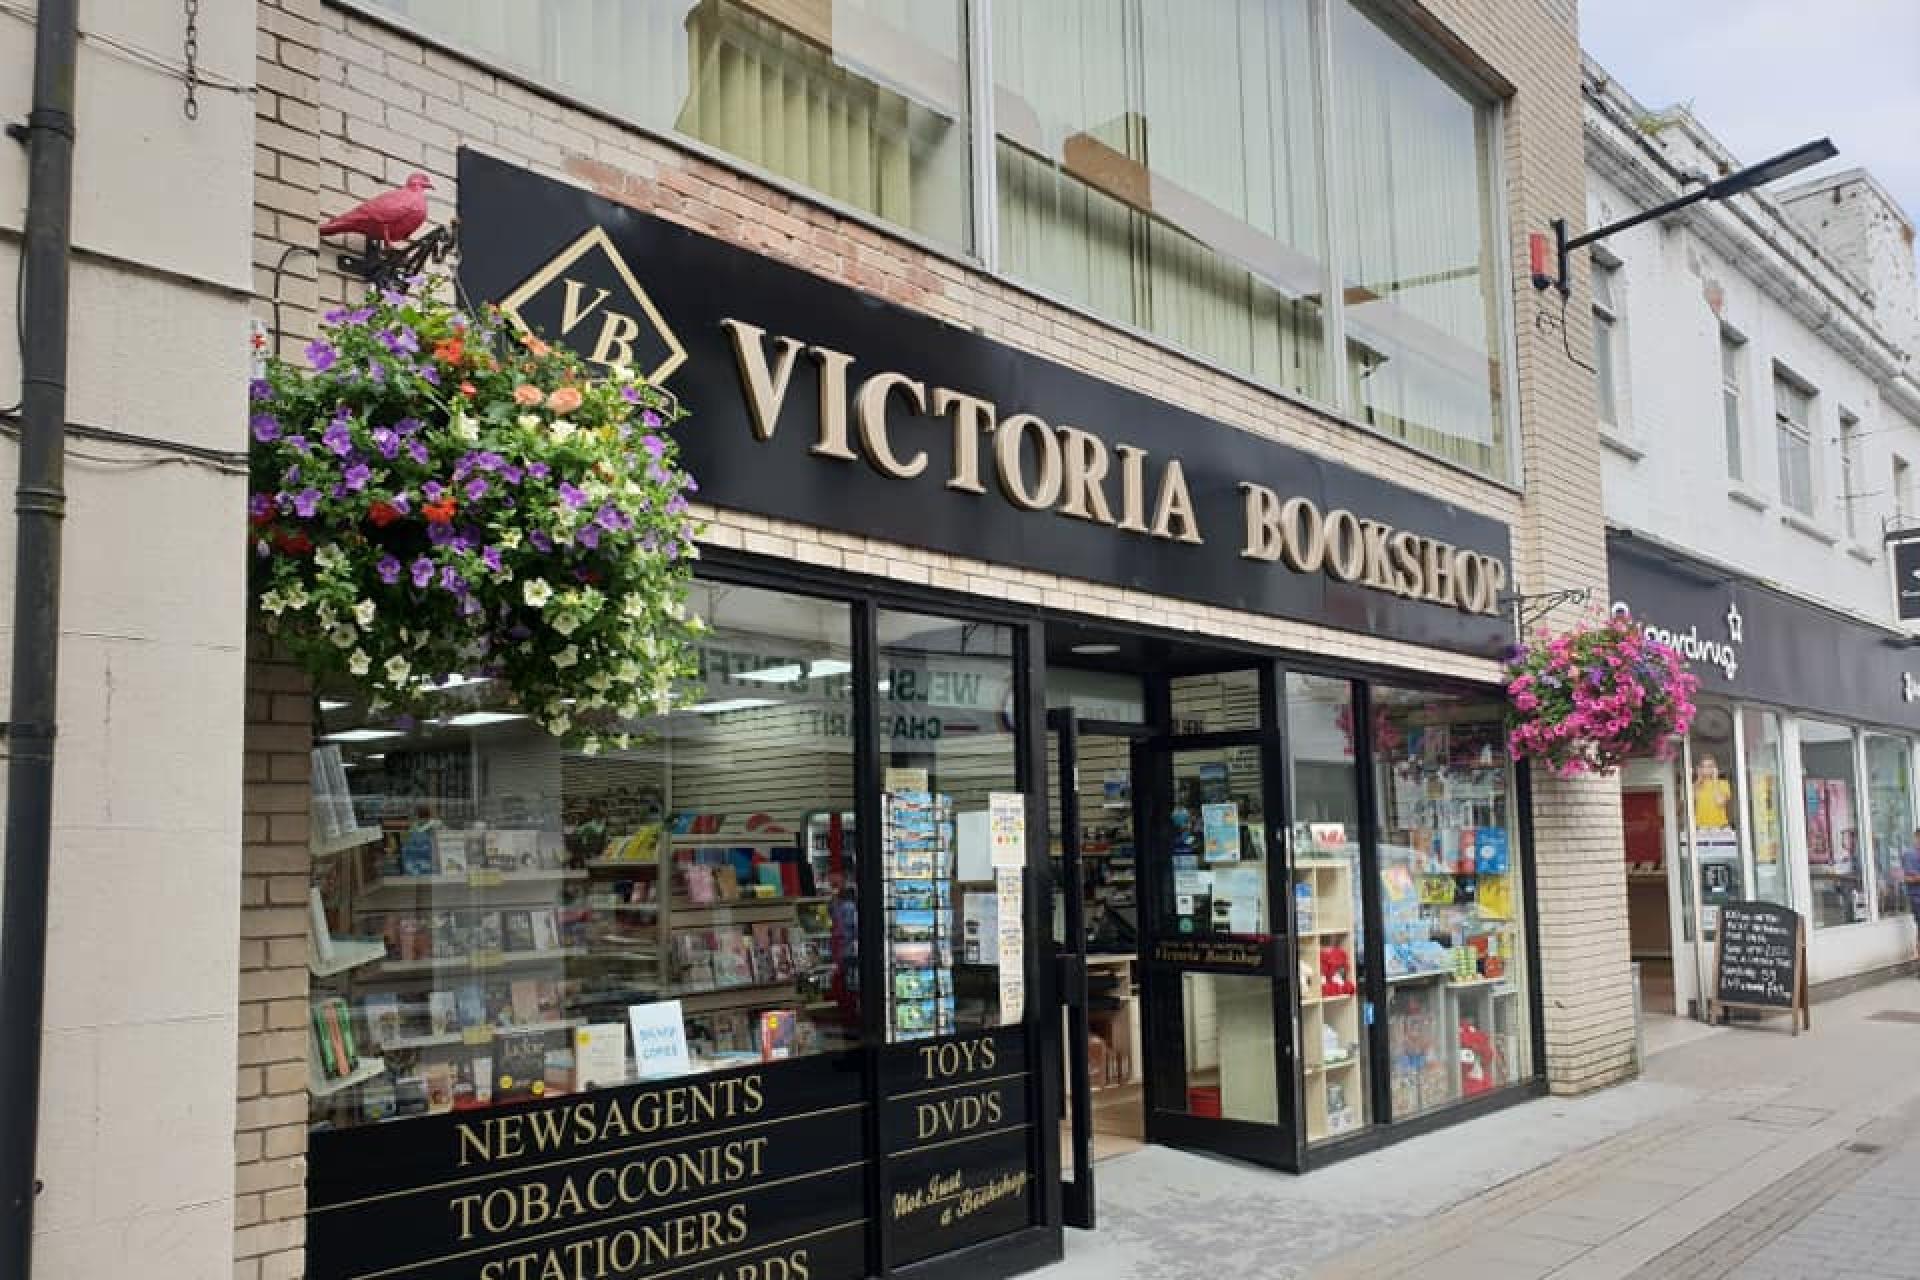 LoveReading Bookshop Feature: Victoria Bookshop (Haverfordwest, Wales)